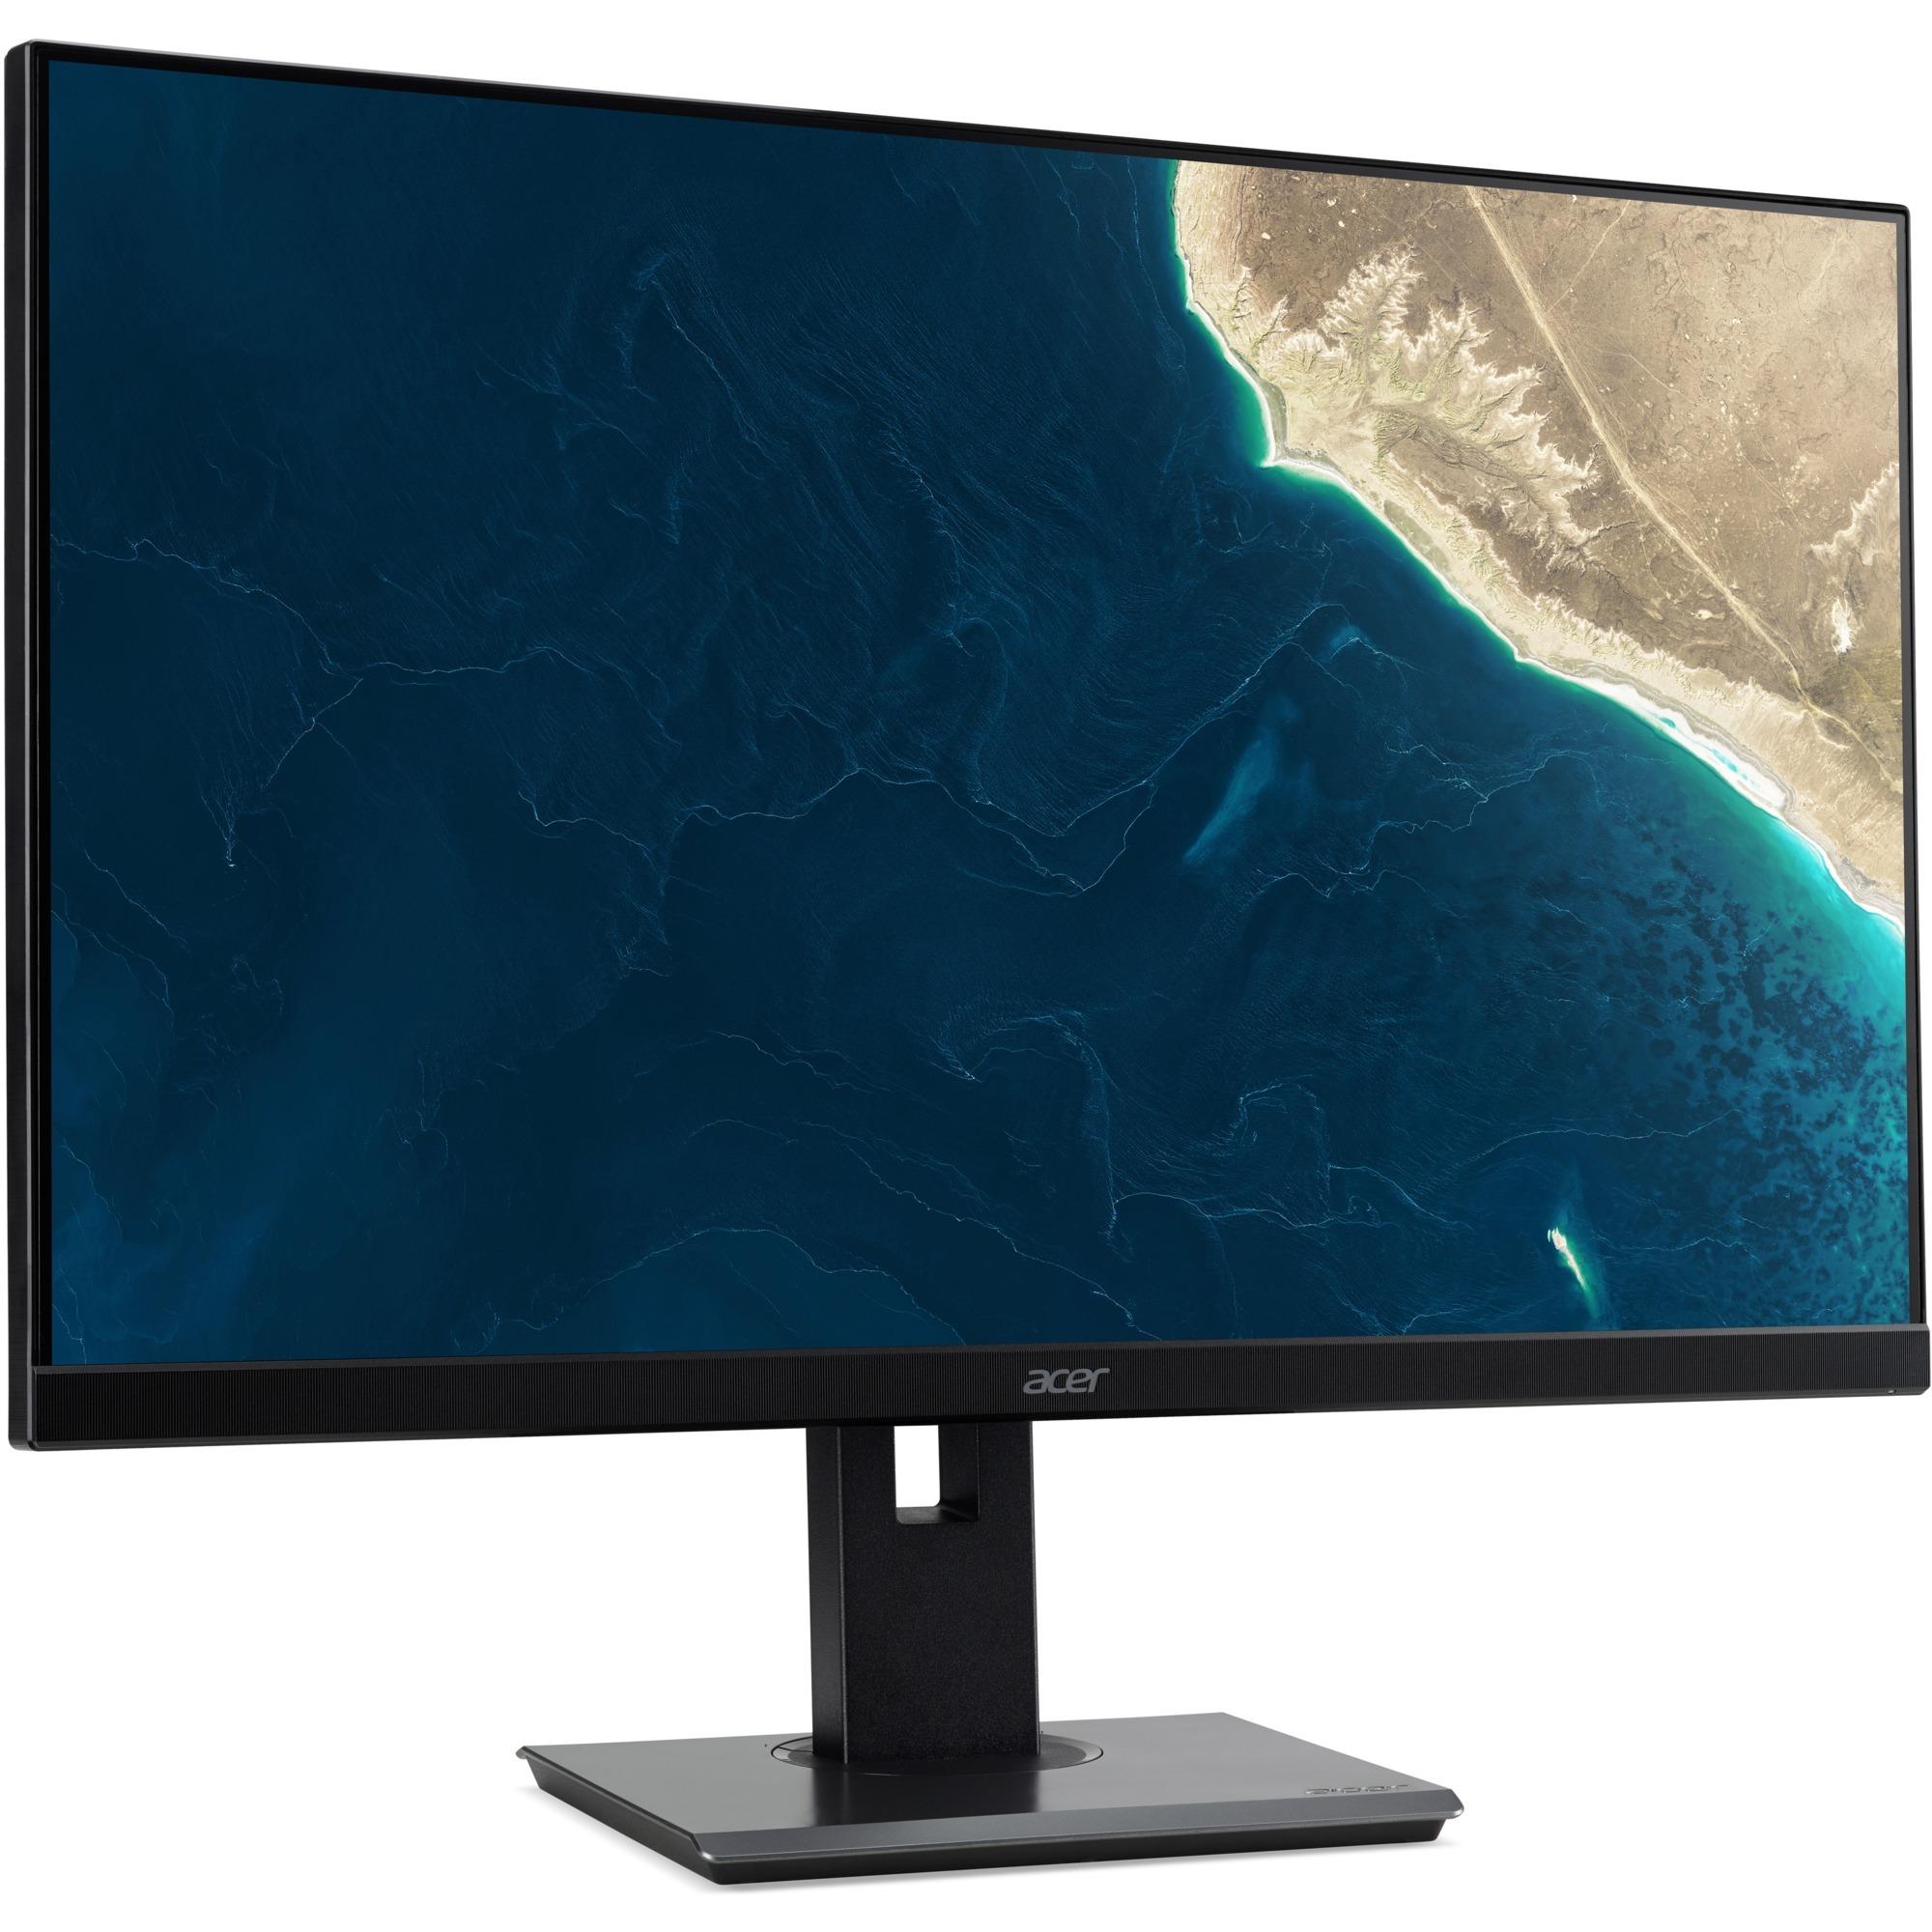 "B7 B247Y bmiprx LED display 60,5 cm (23.8"") Full HD Plana Mate Negro, Monitor LED"